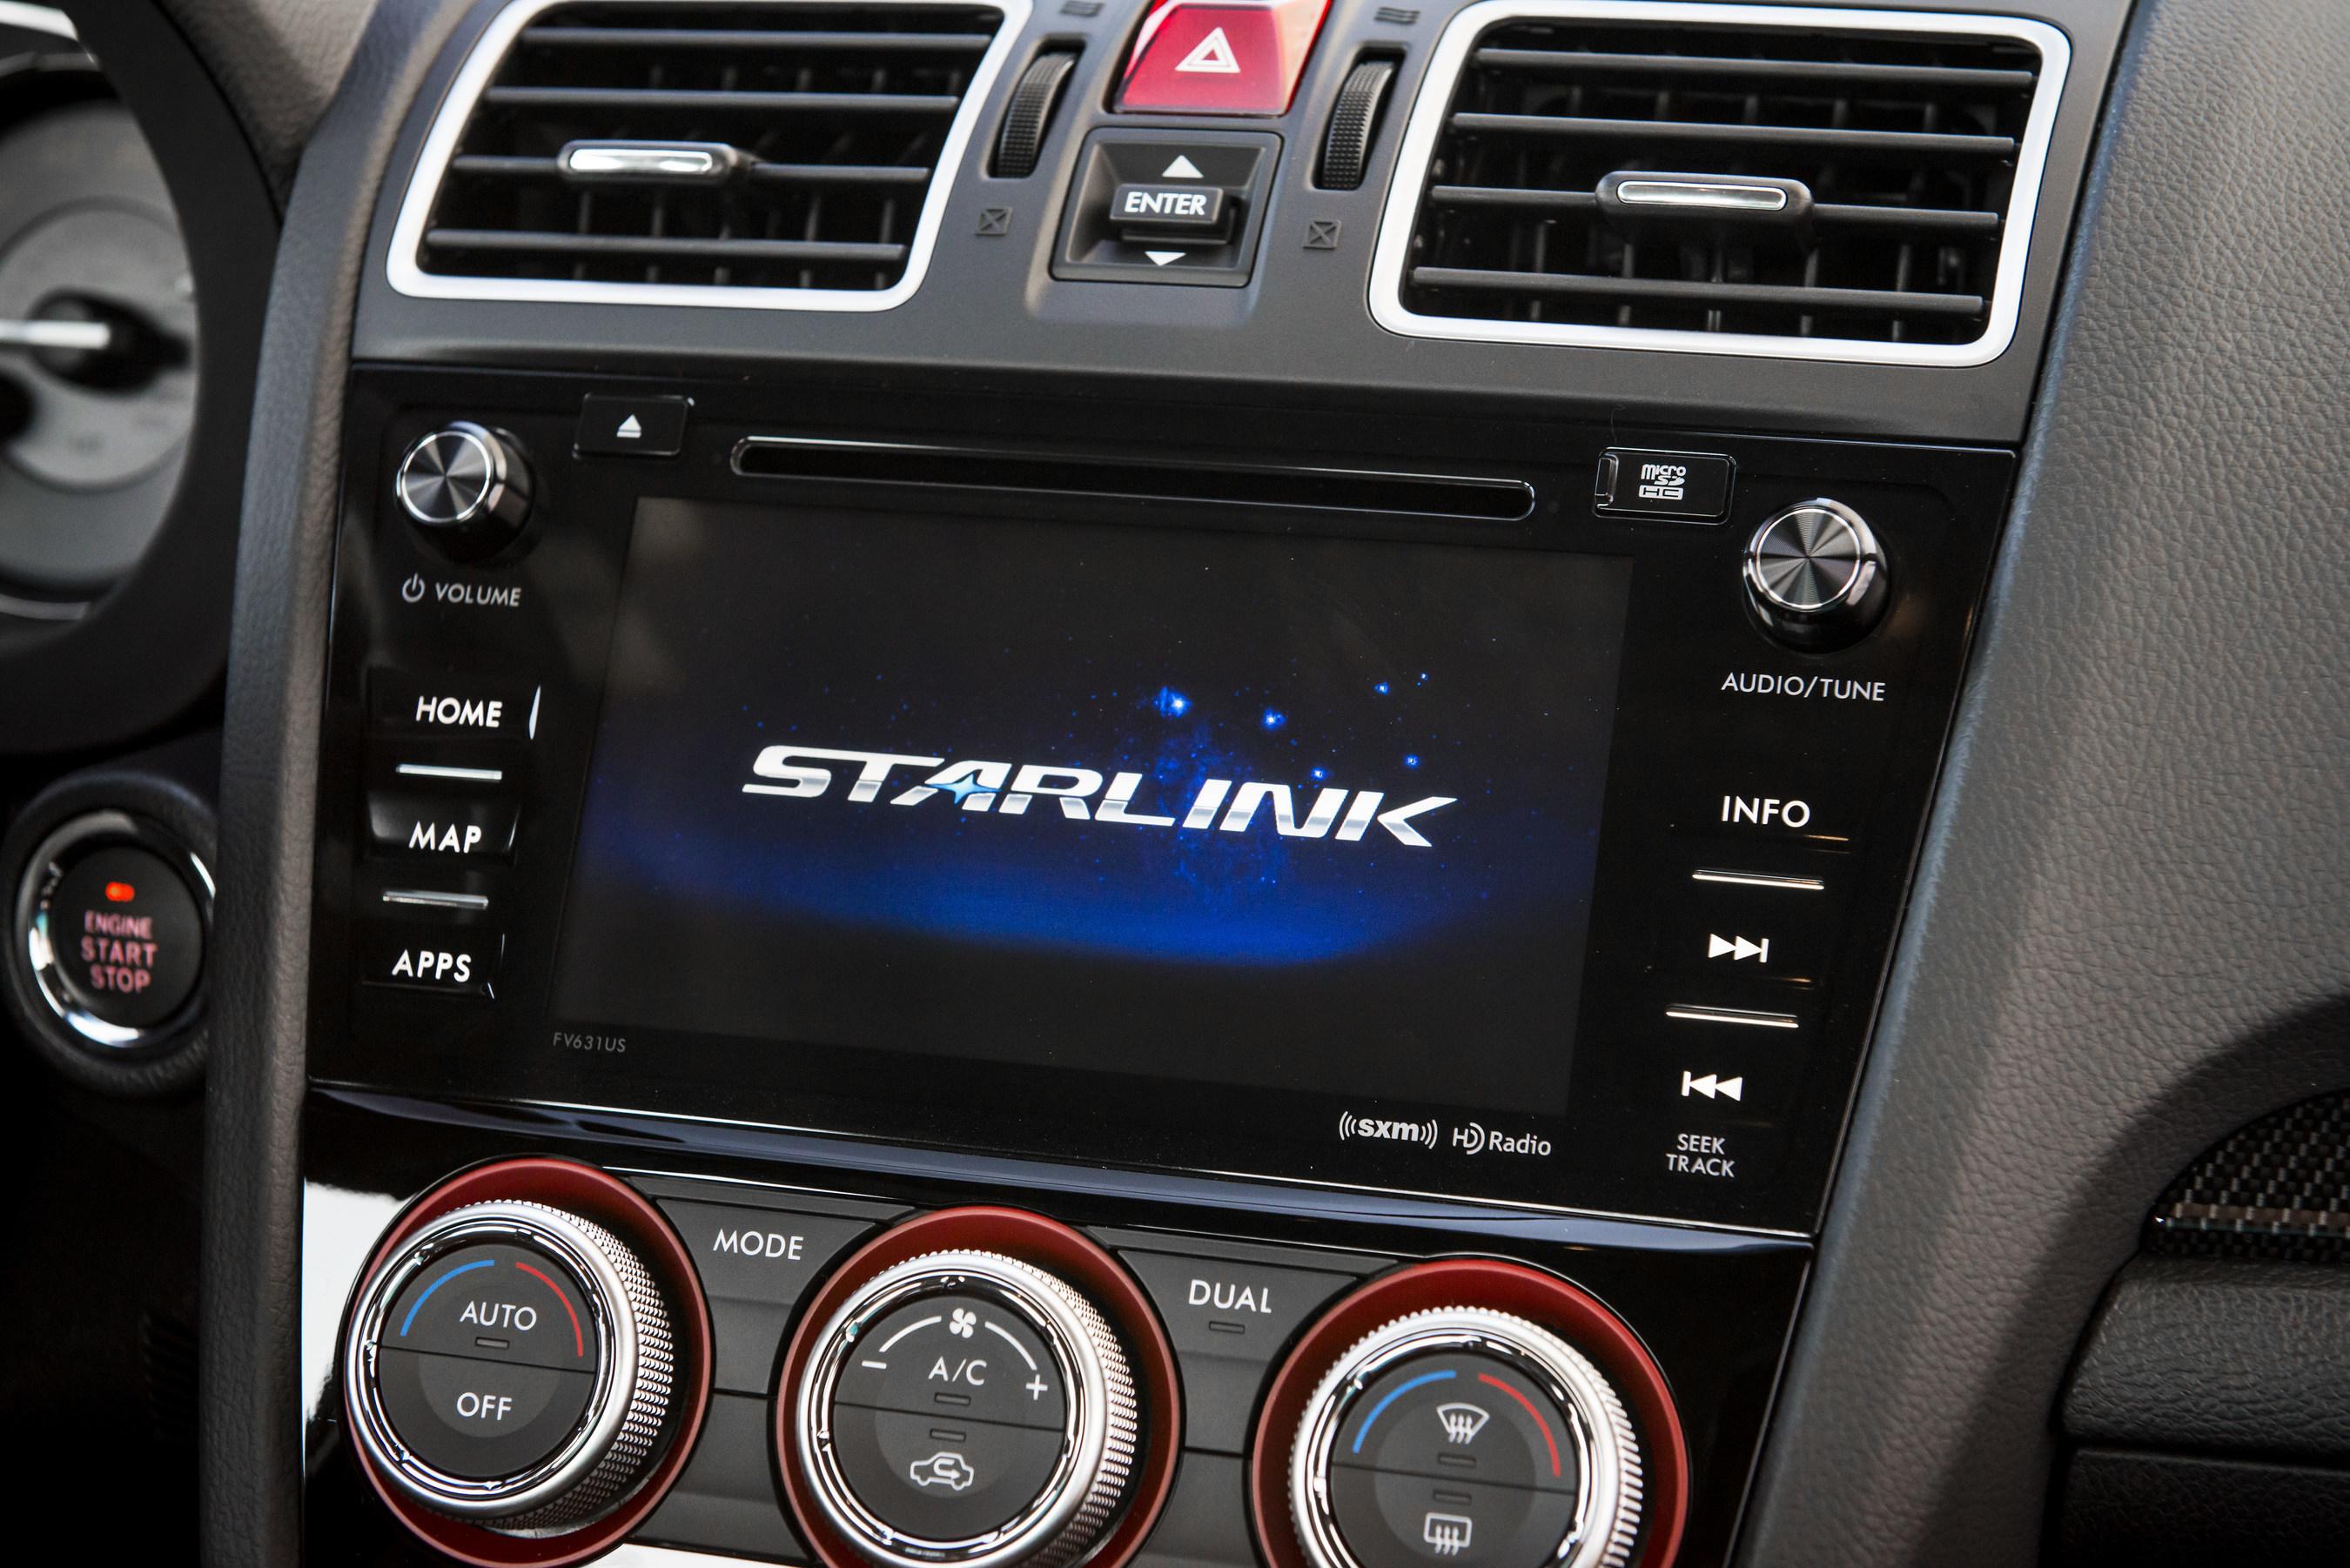 2016 STI STARLINK